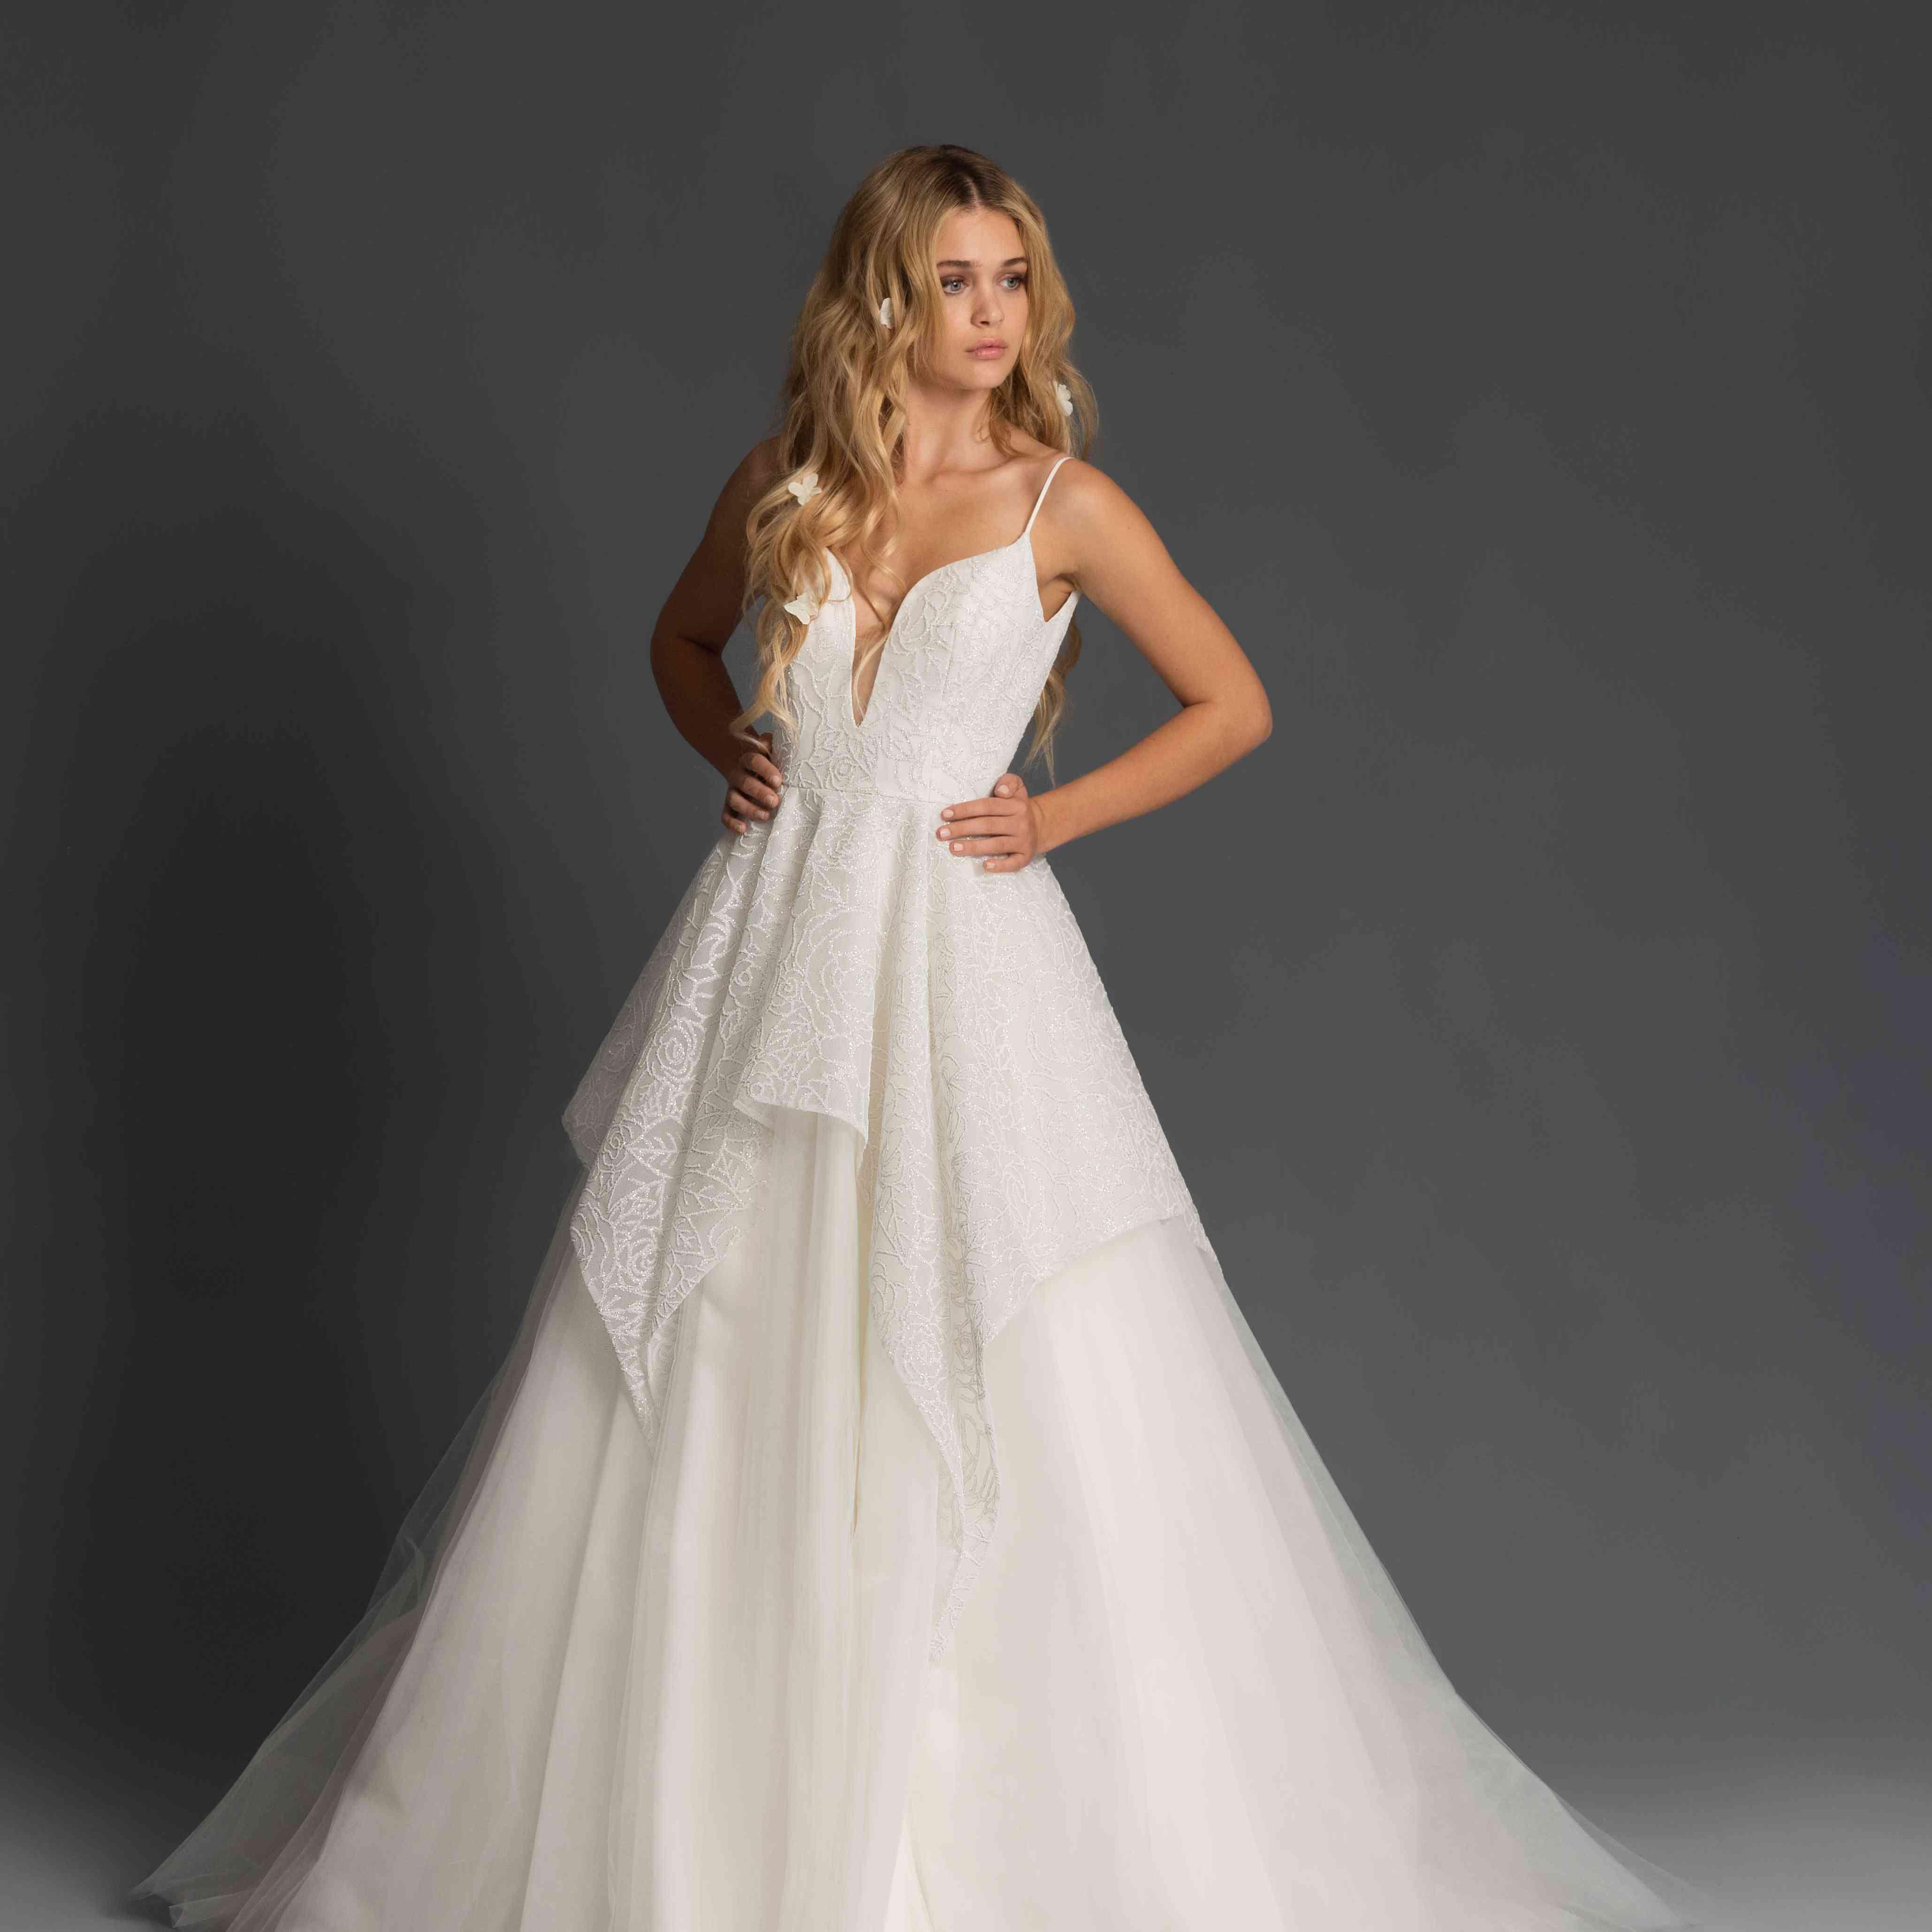 Model in sleeveless peplum wedding dress